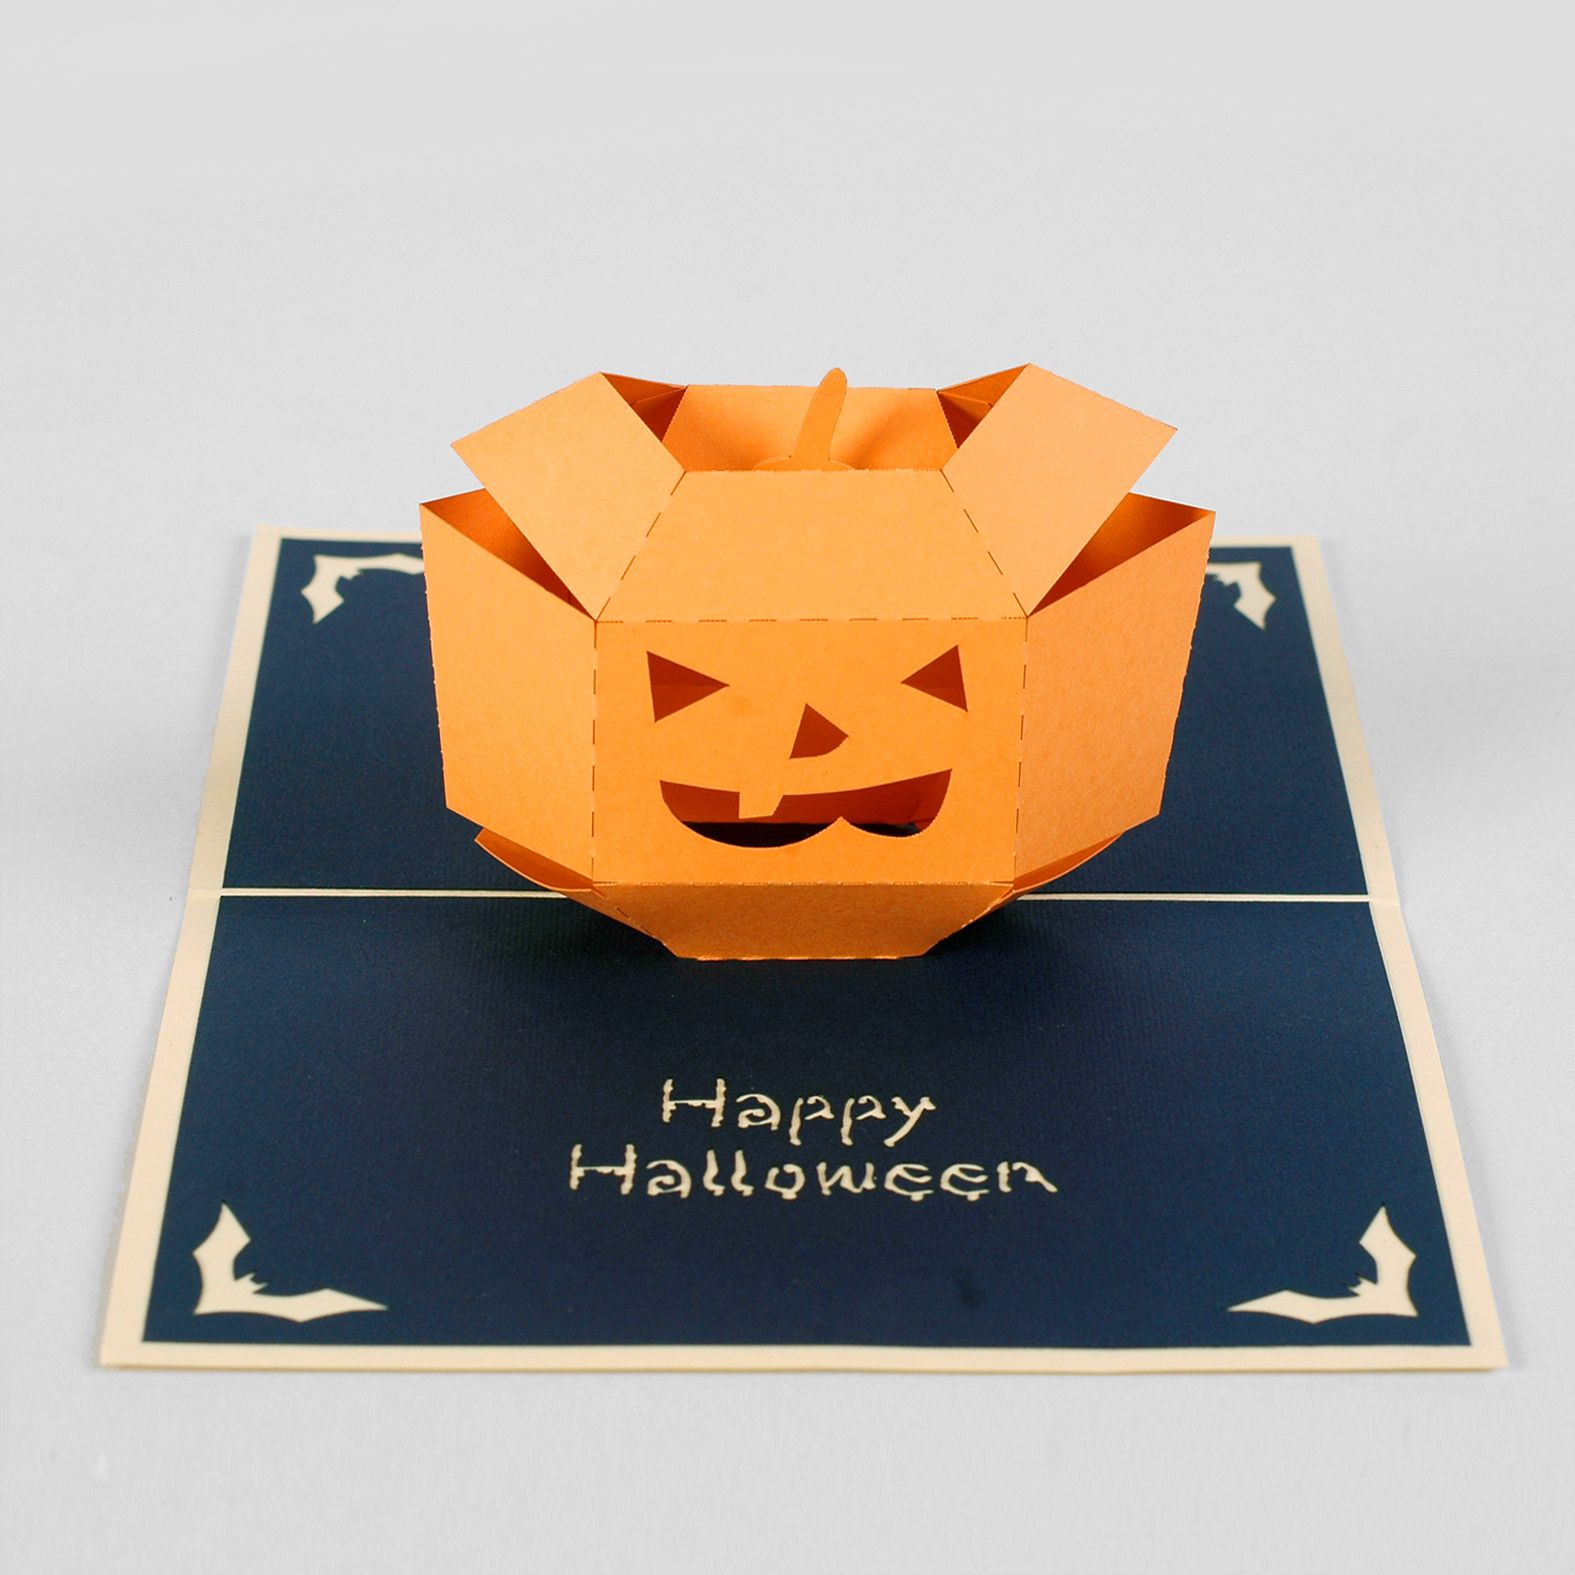 thiệp nổi halloween